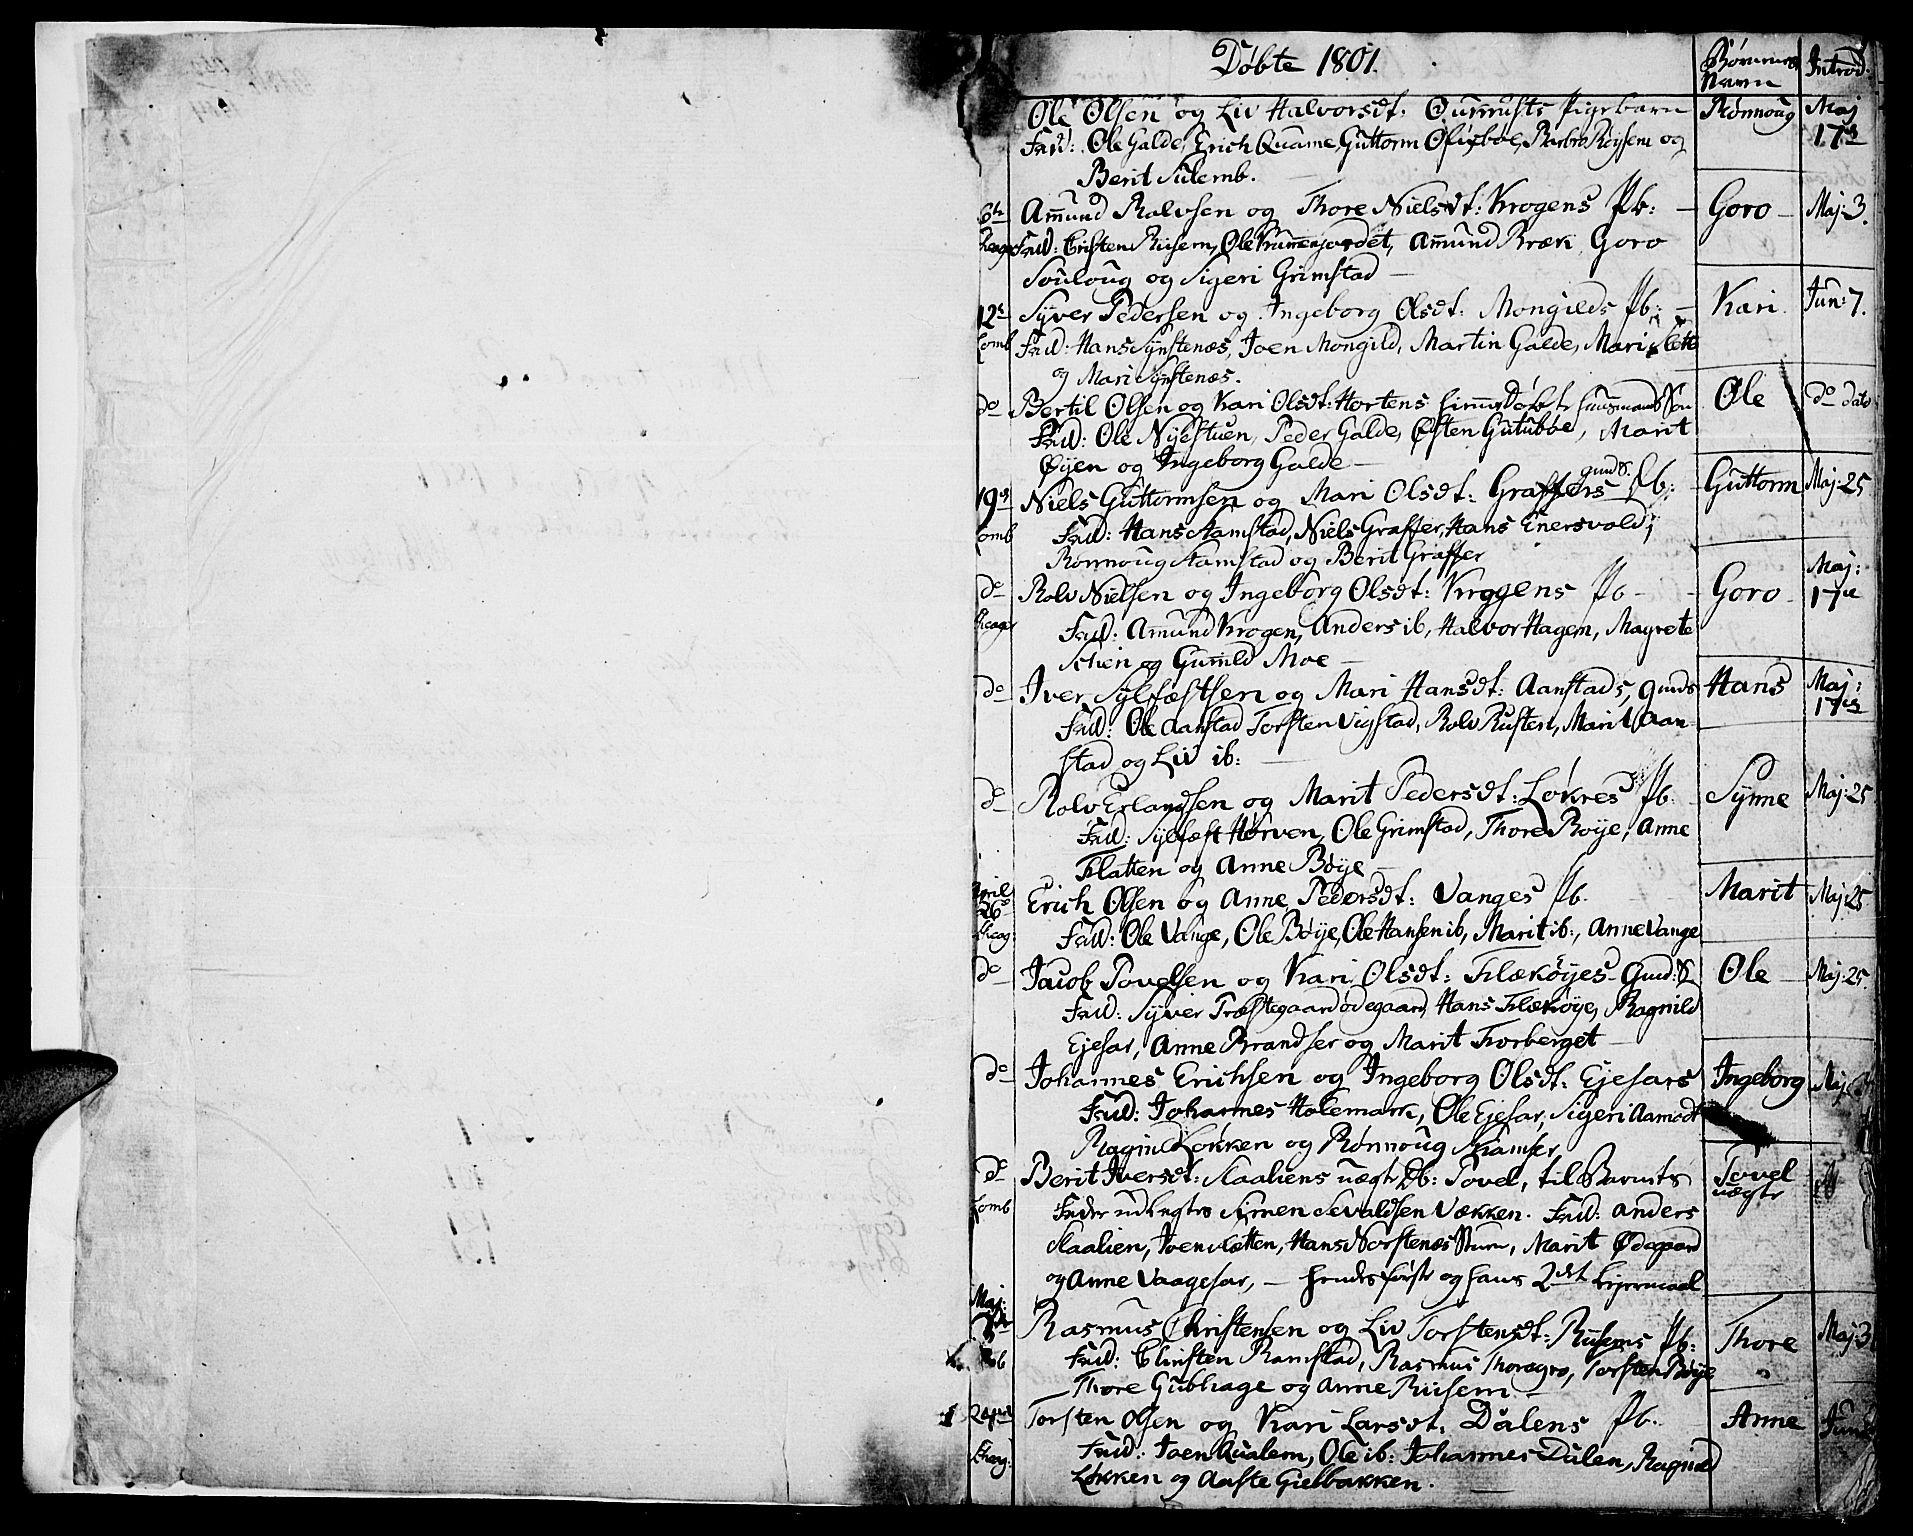 SAH, Lom prestekontor, K/L0003: Parish register (official) no. 3, 1801-1825, p. 1